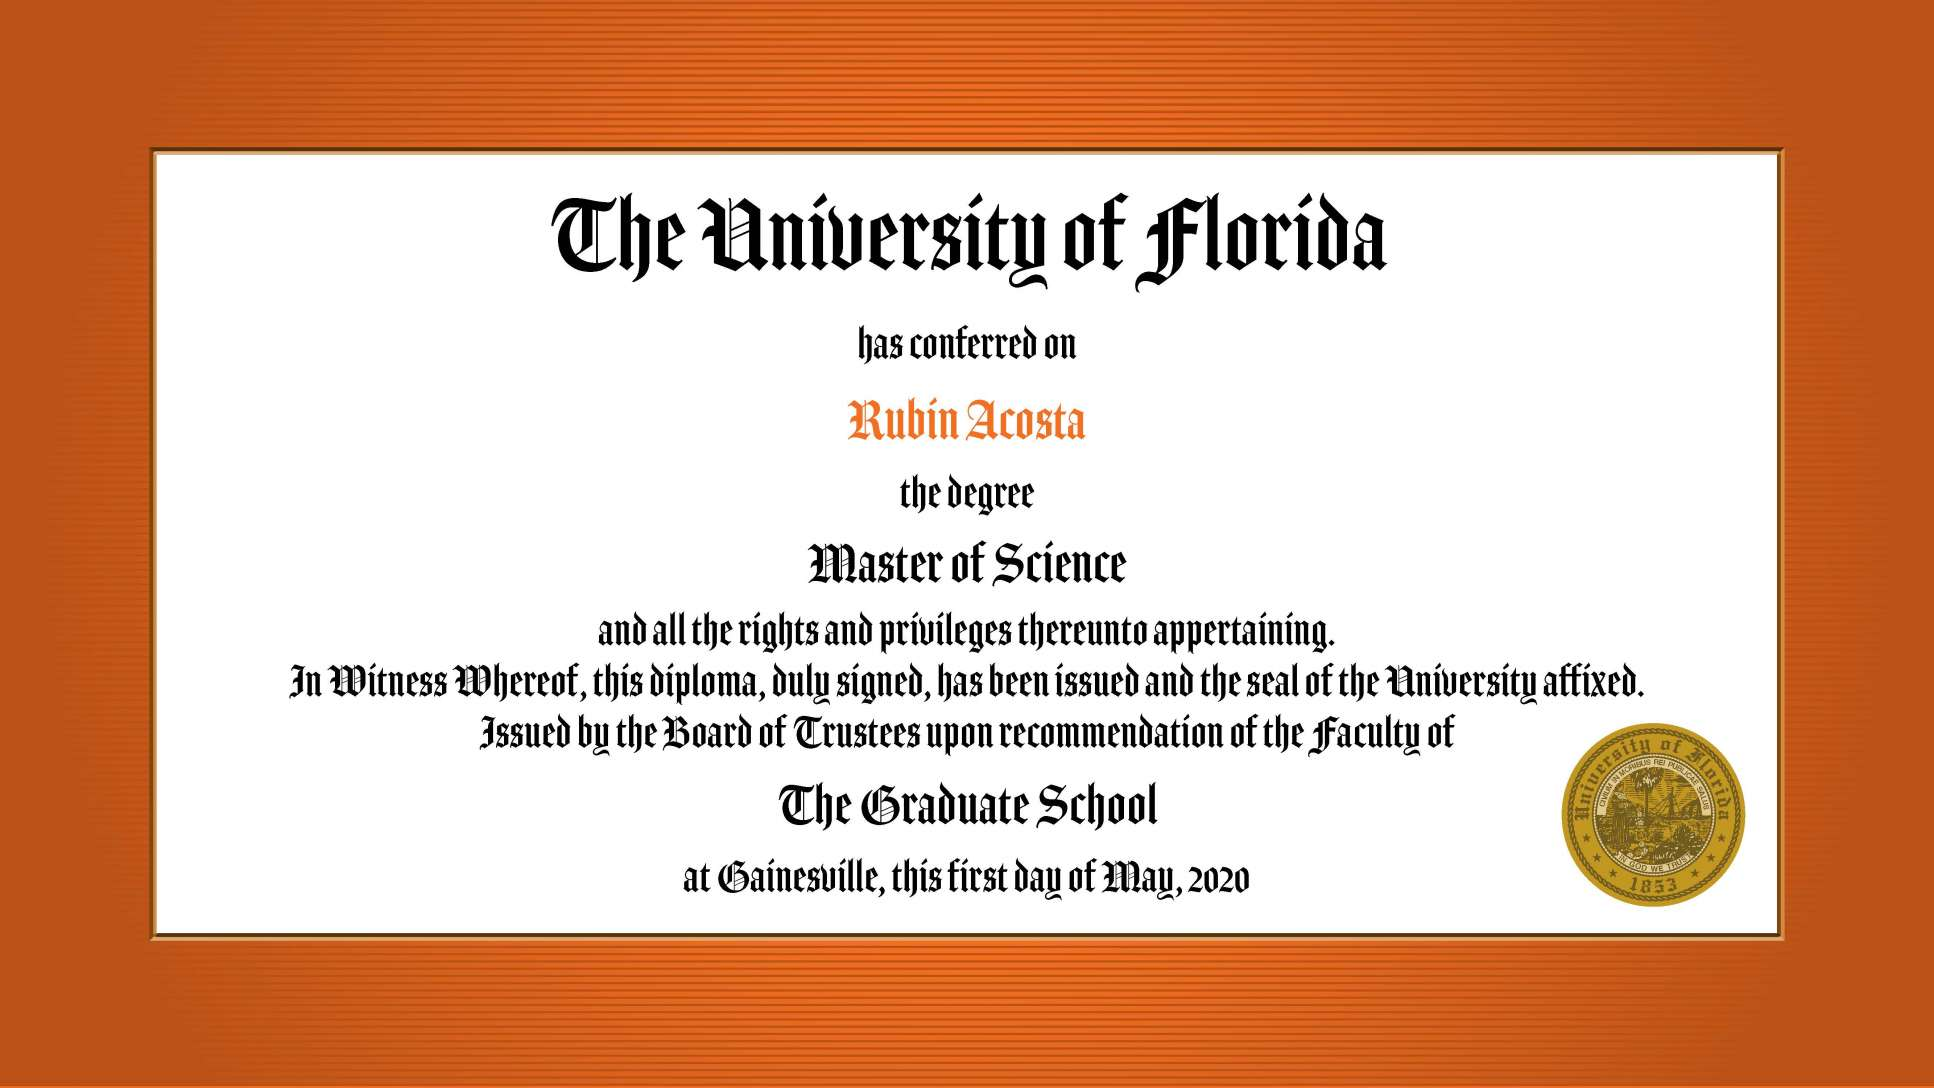 UF College of Medicine master's degree recipients video